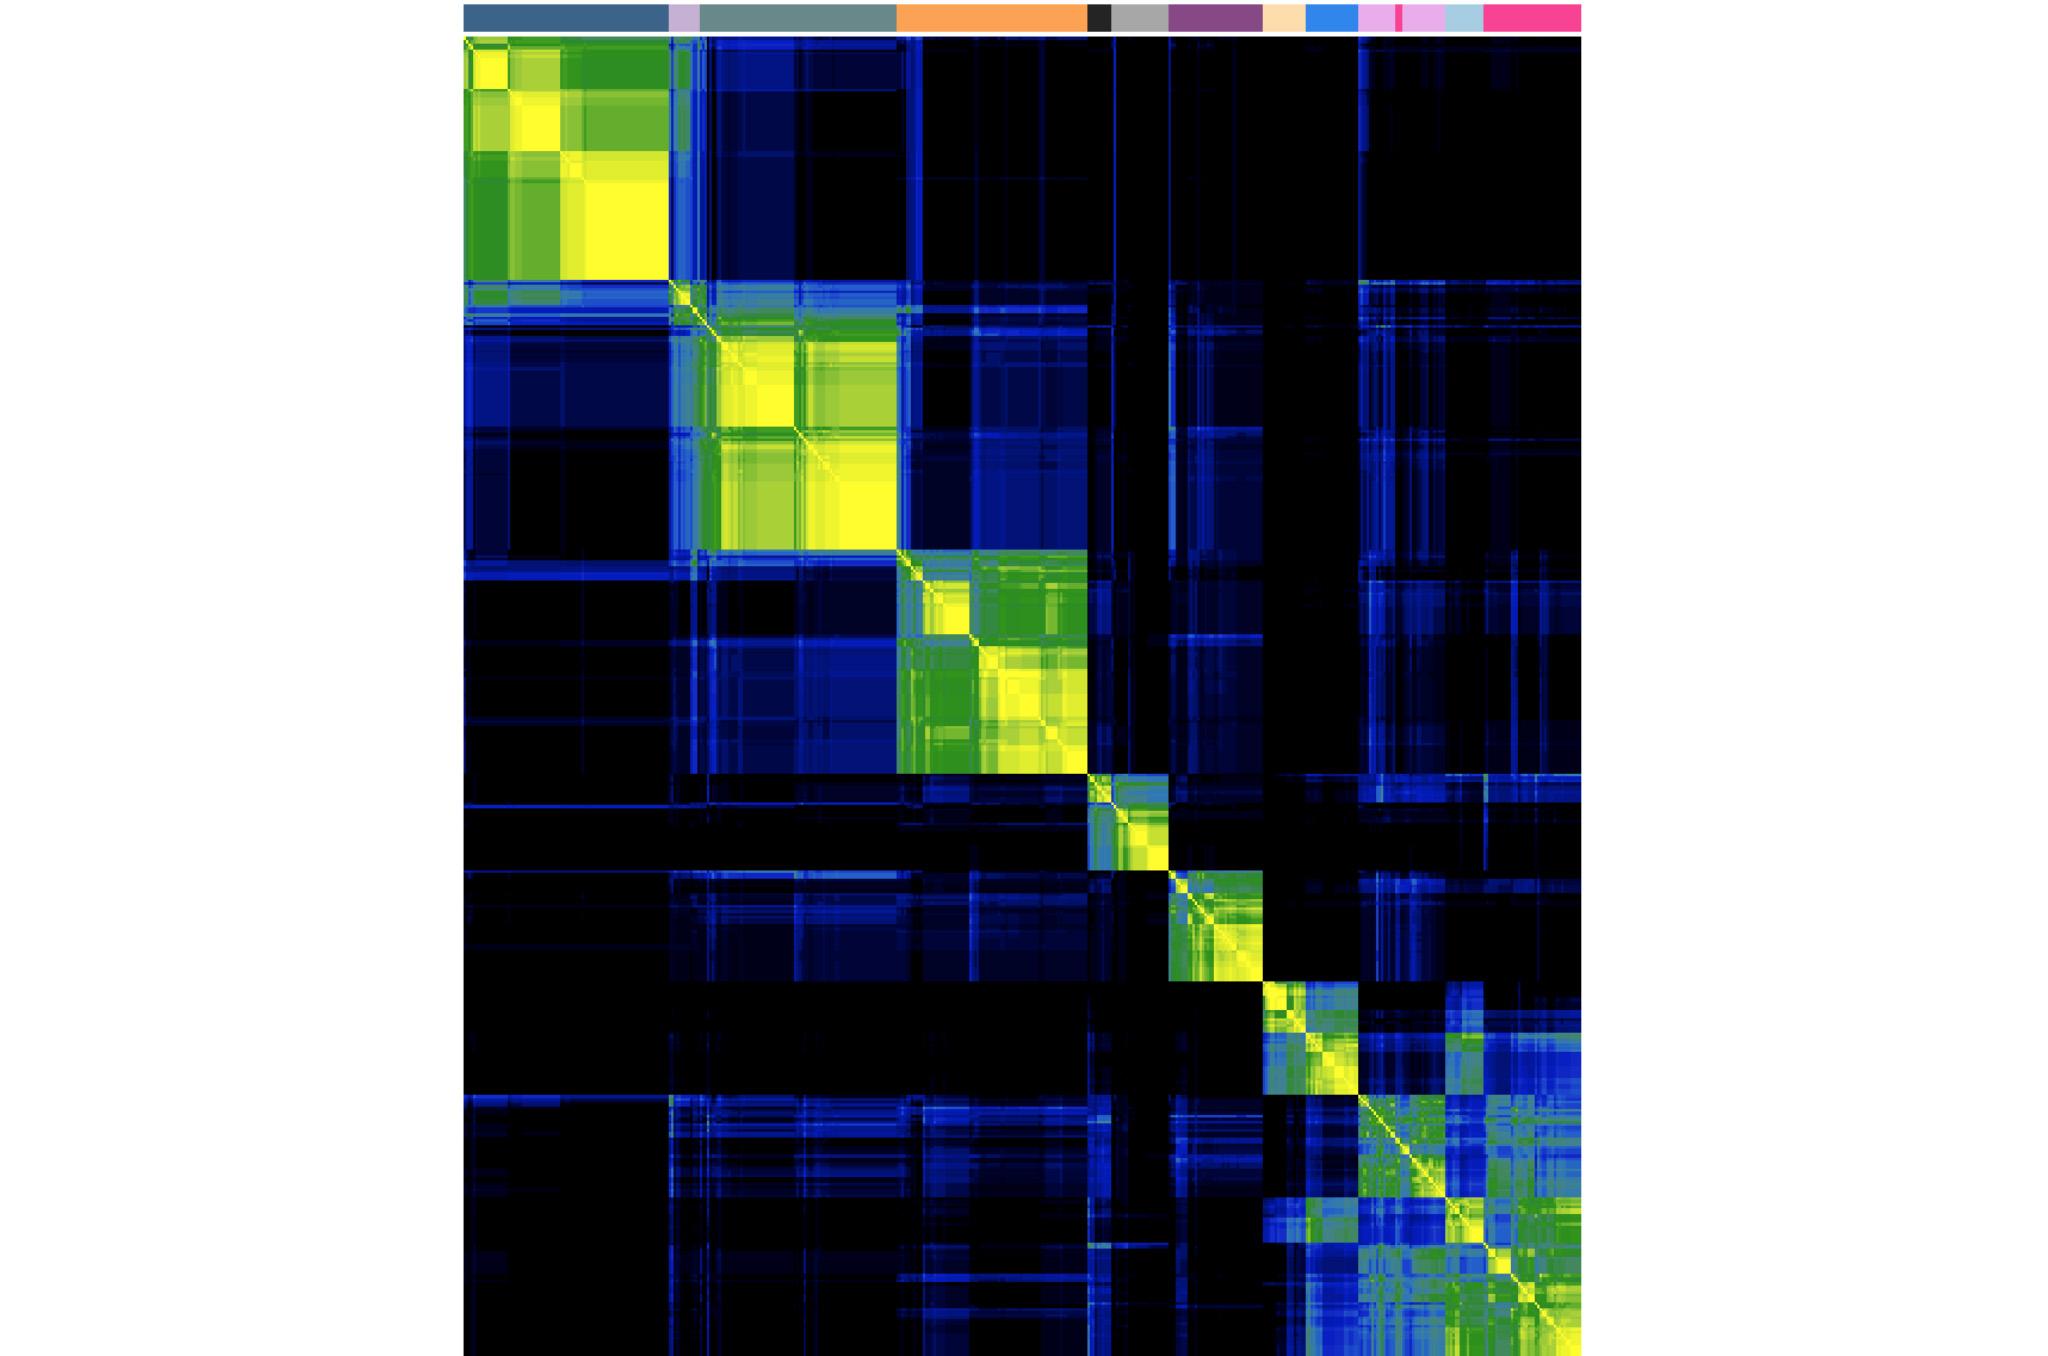 L5 heatmap.jpg